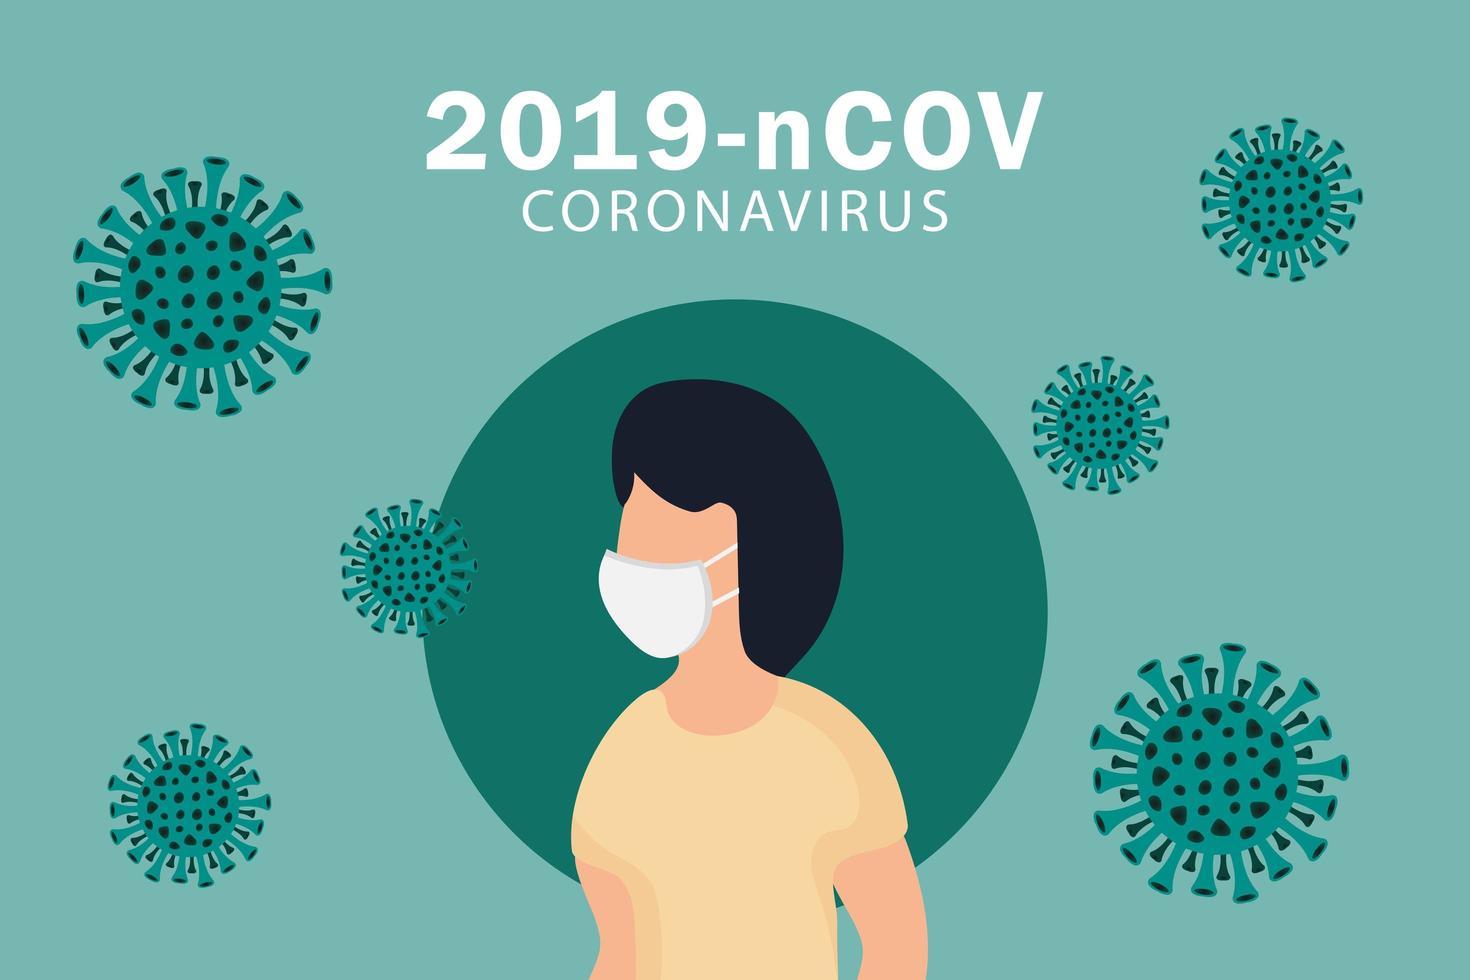 cartaz do coronavirus covid-19 ou 2019-ncov vetor